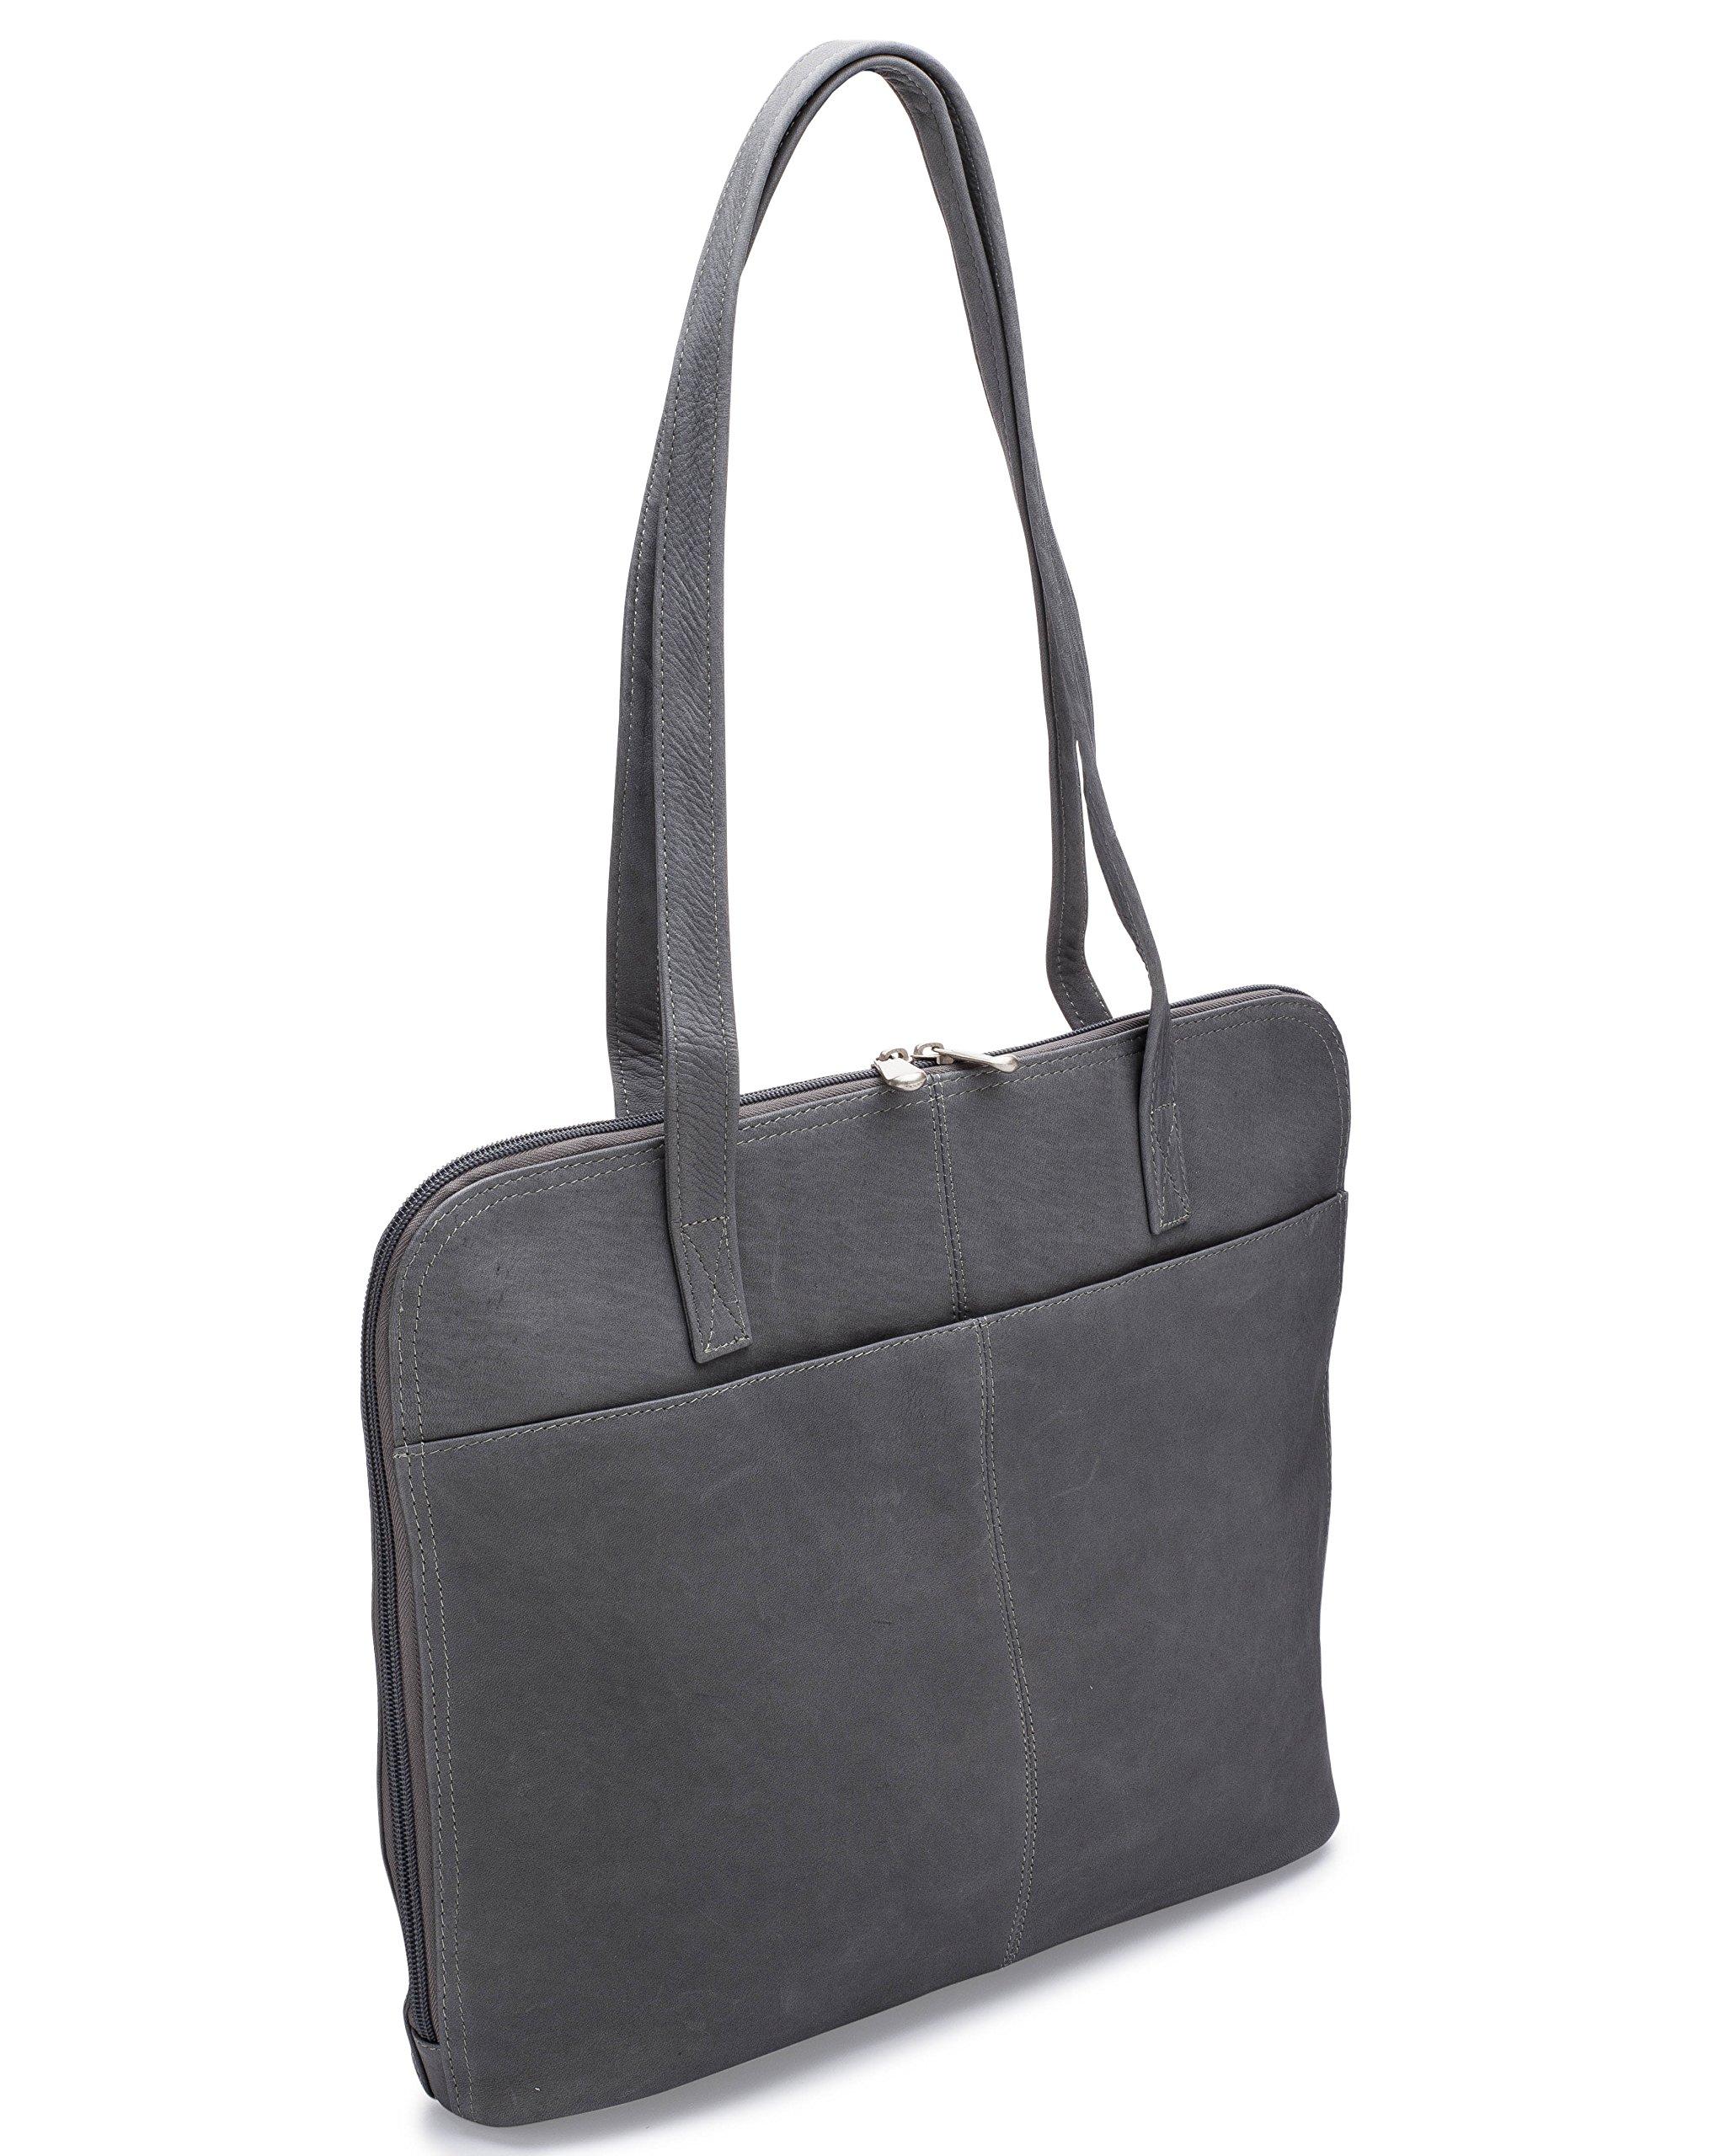 Le Donne Leather Company LD-8042-Gray Handbag